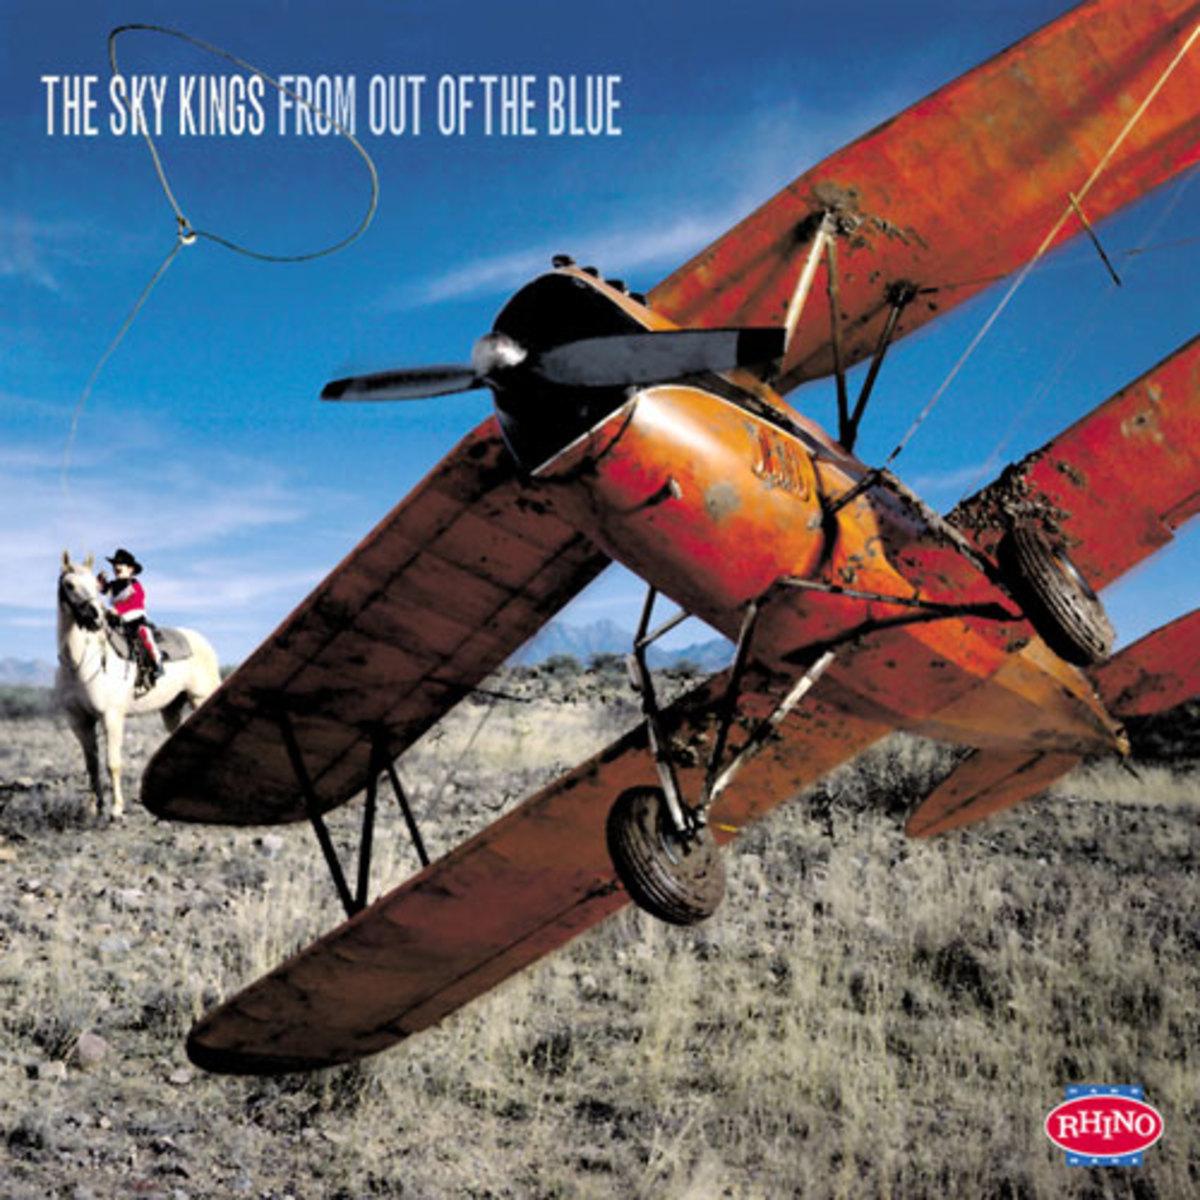 Sky Kings album